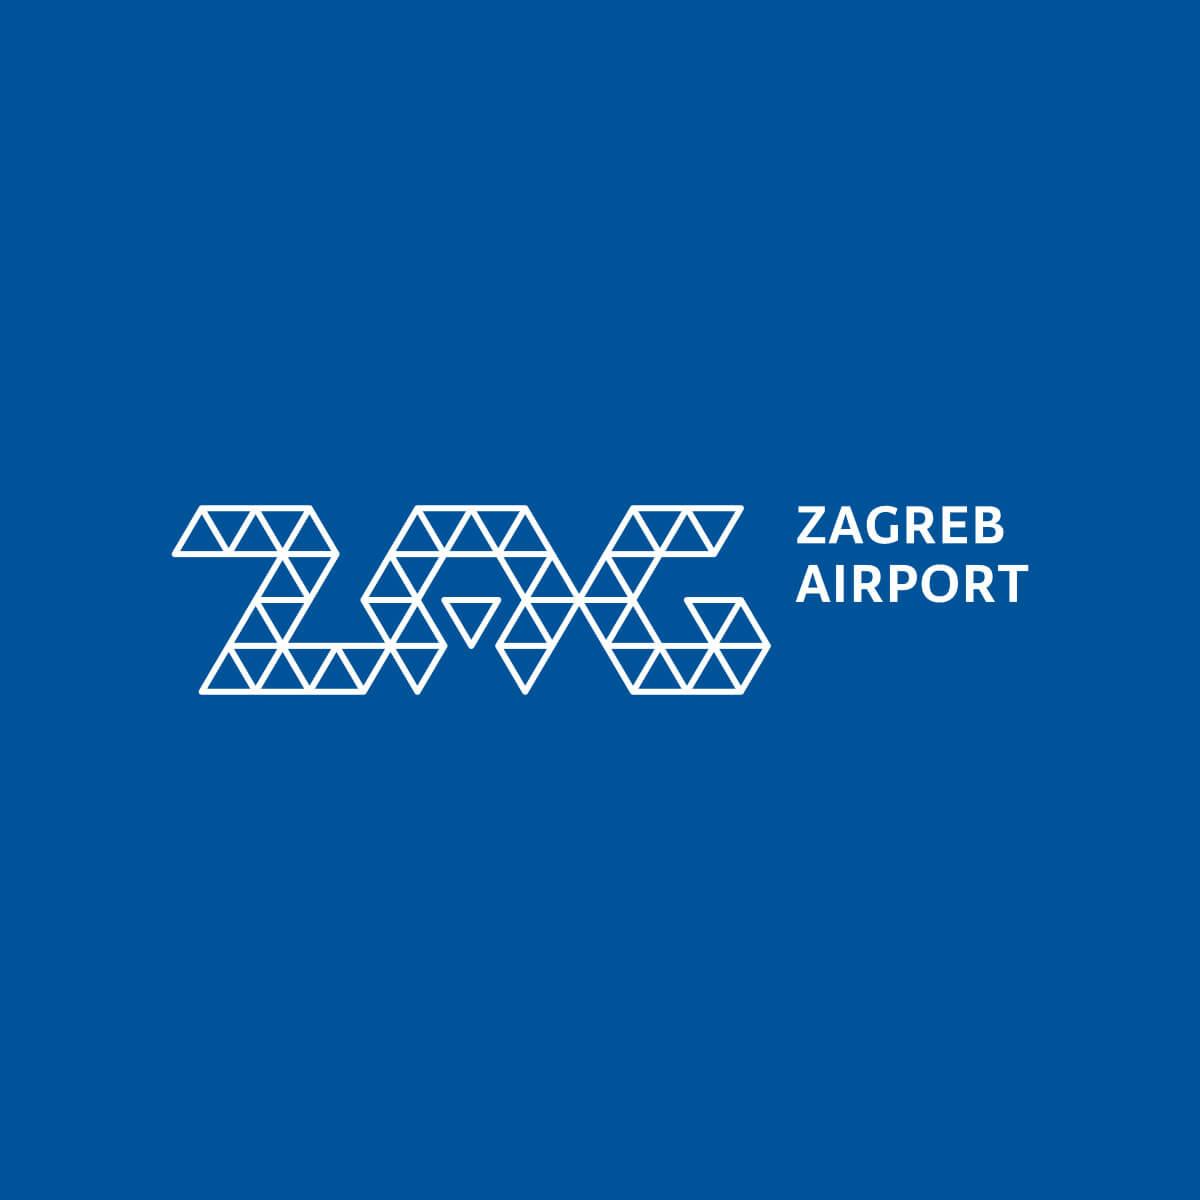 Međunarodna Zracna Luka Zagreb Franjo Tuđman Statistika Za 2020 Godinu